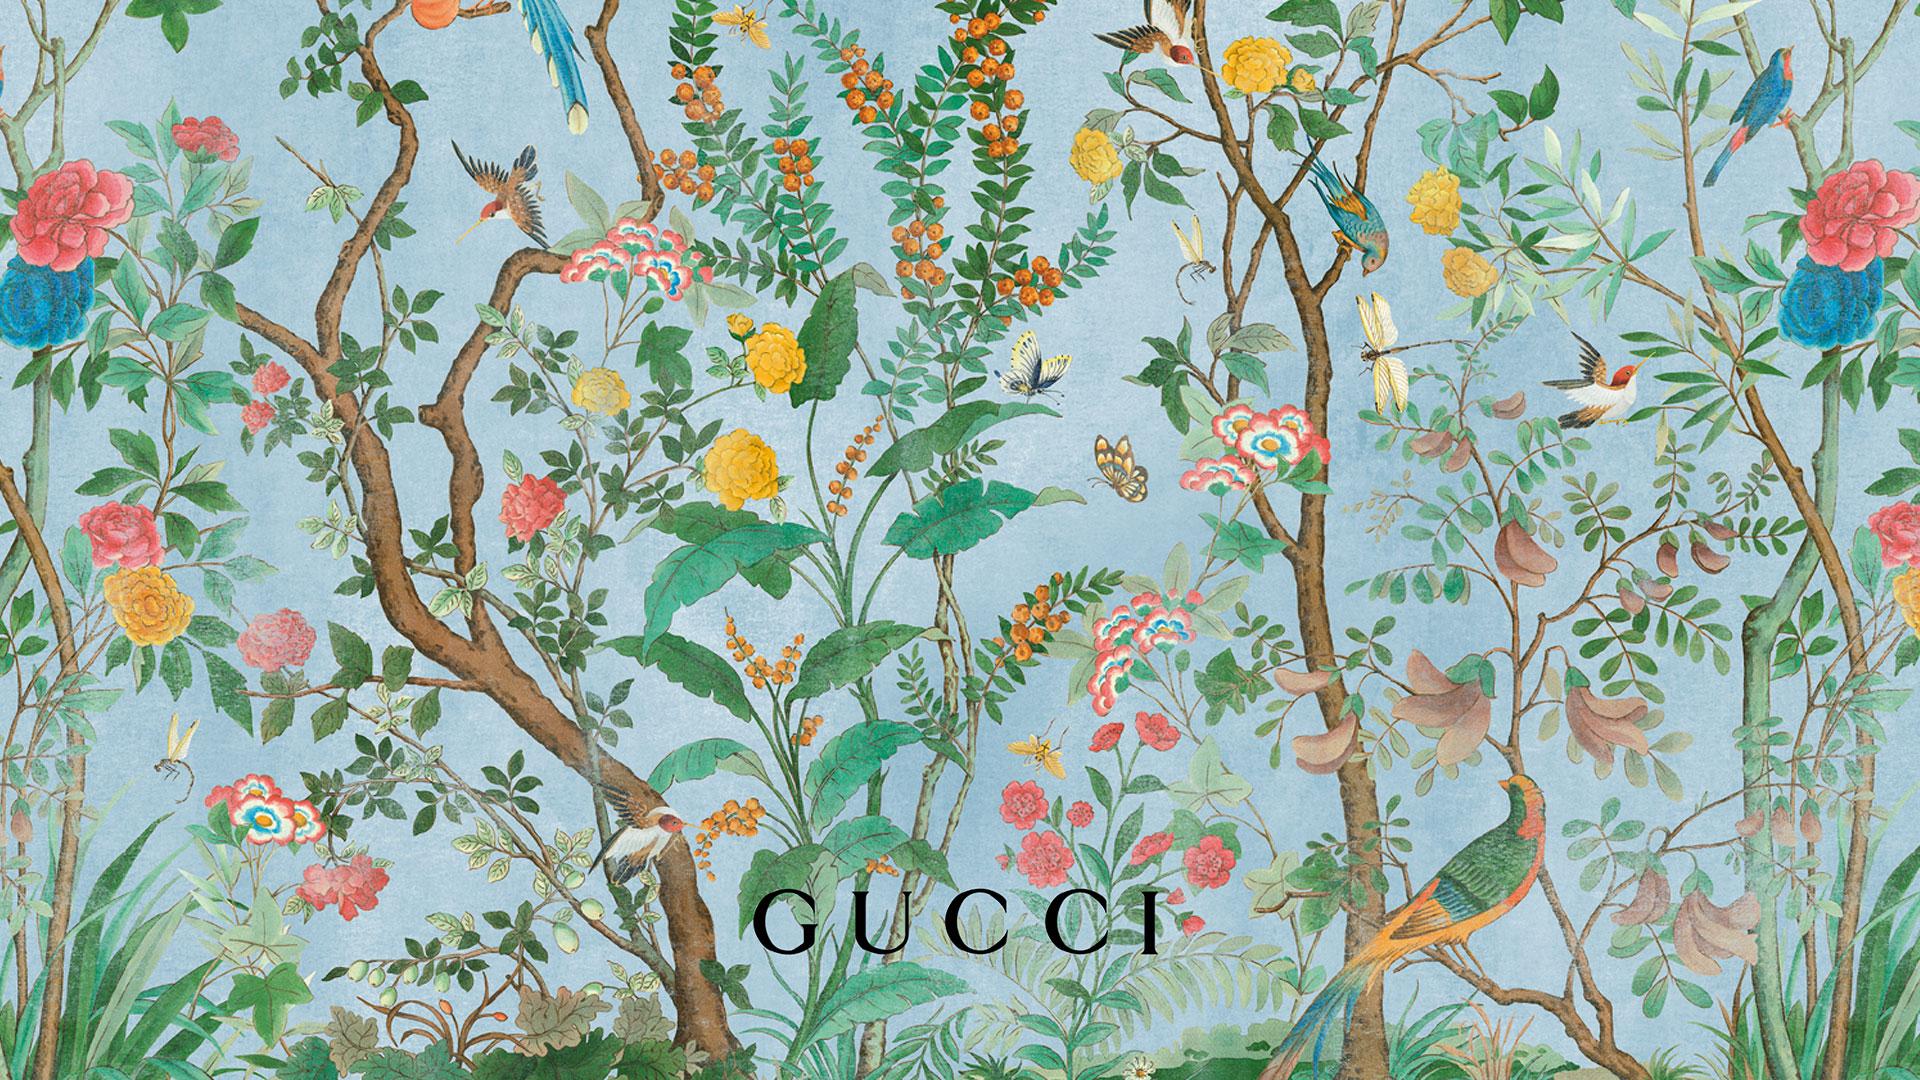 Estampados Tian de Gucci hero asset